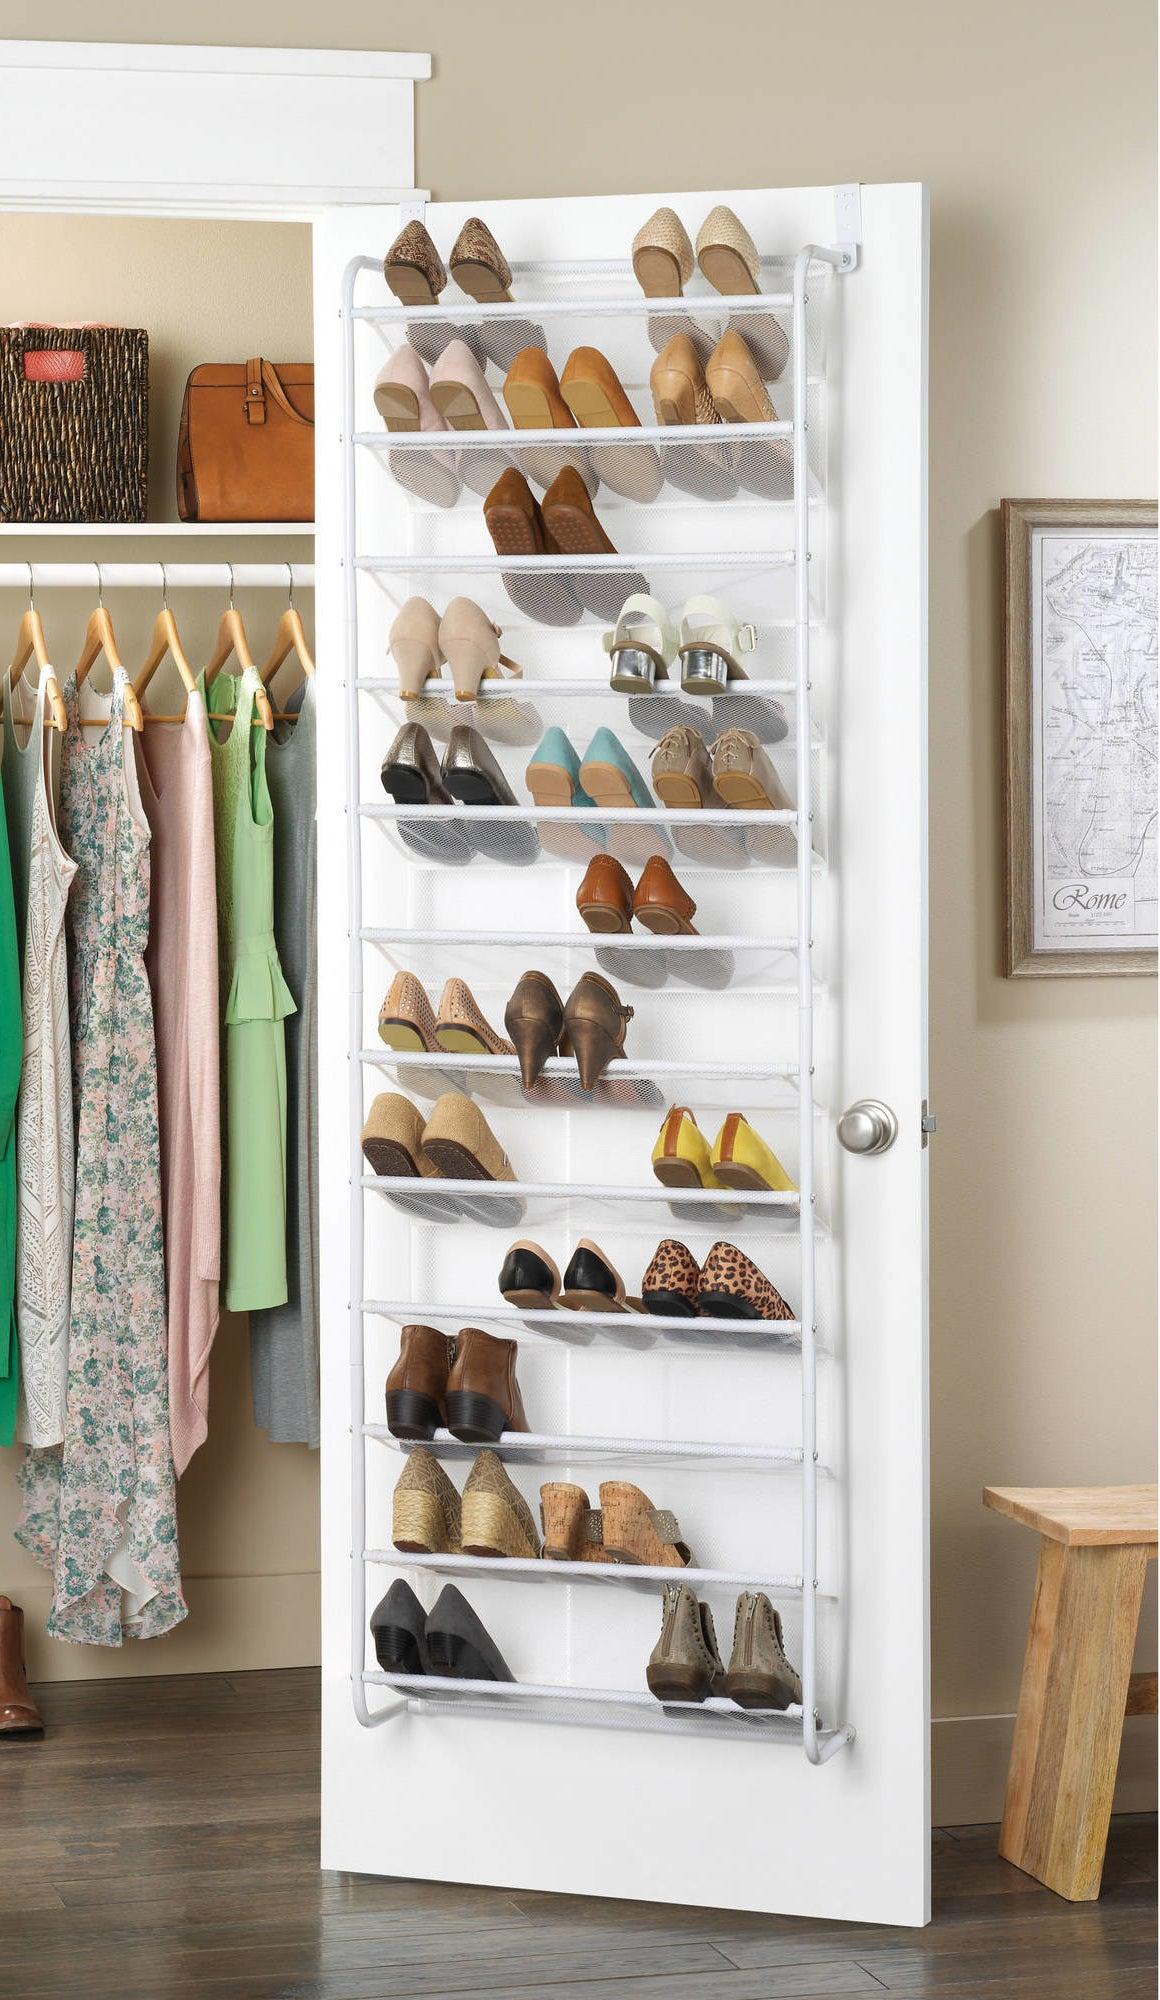 The white over-the-door shoe organizer